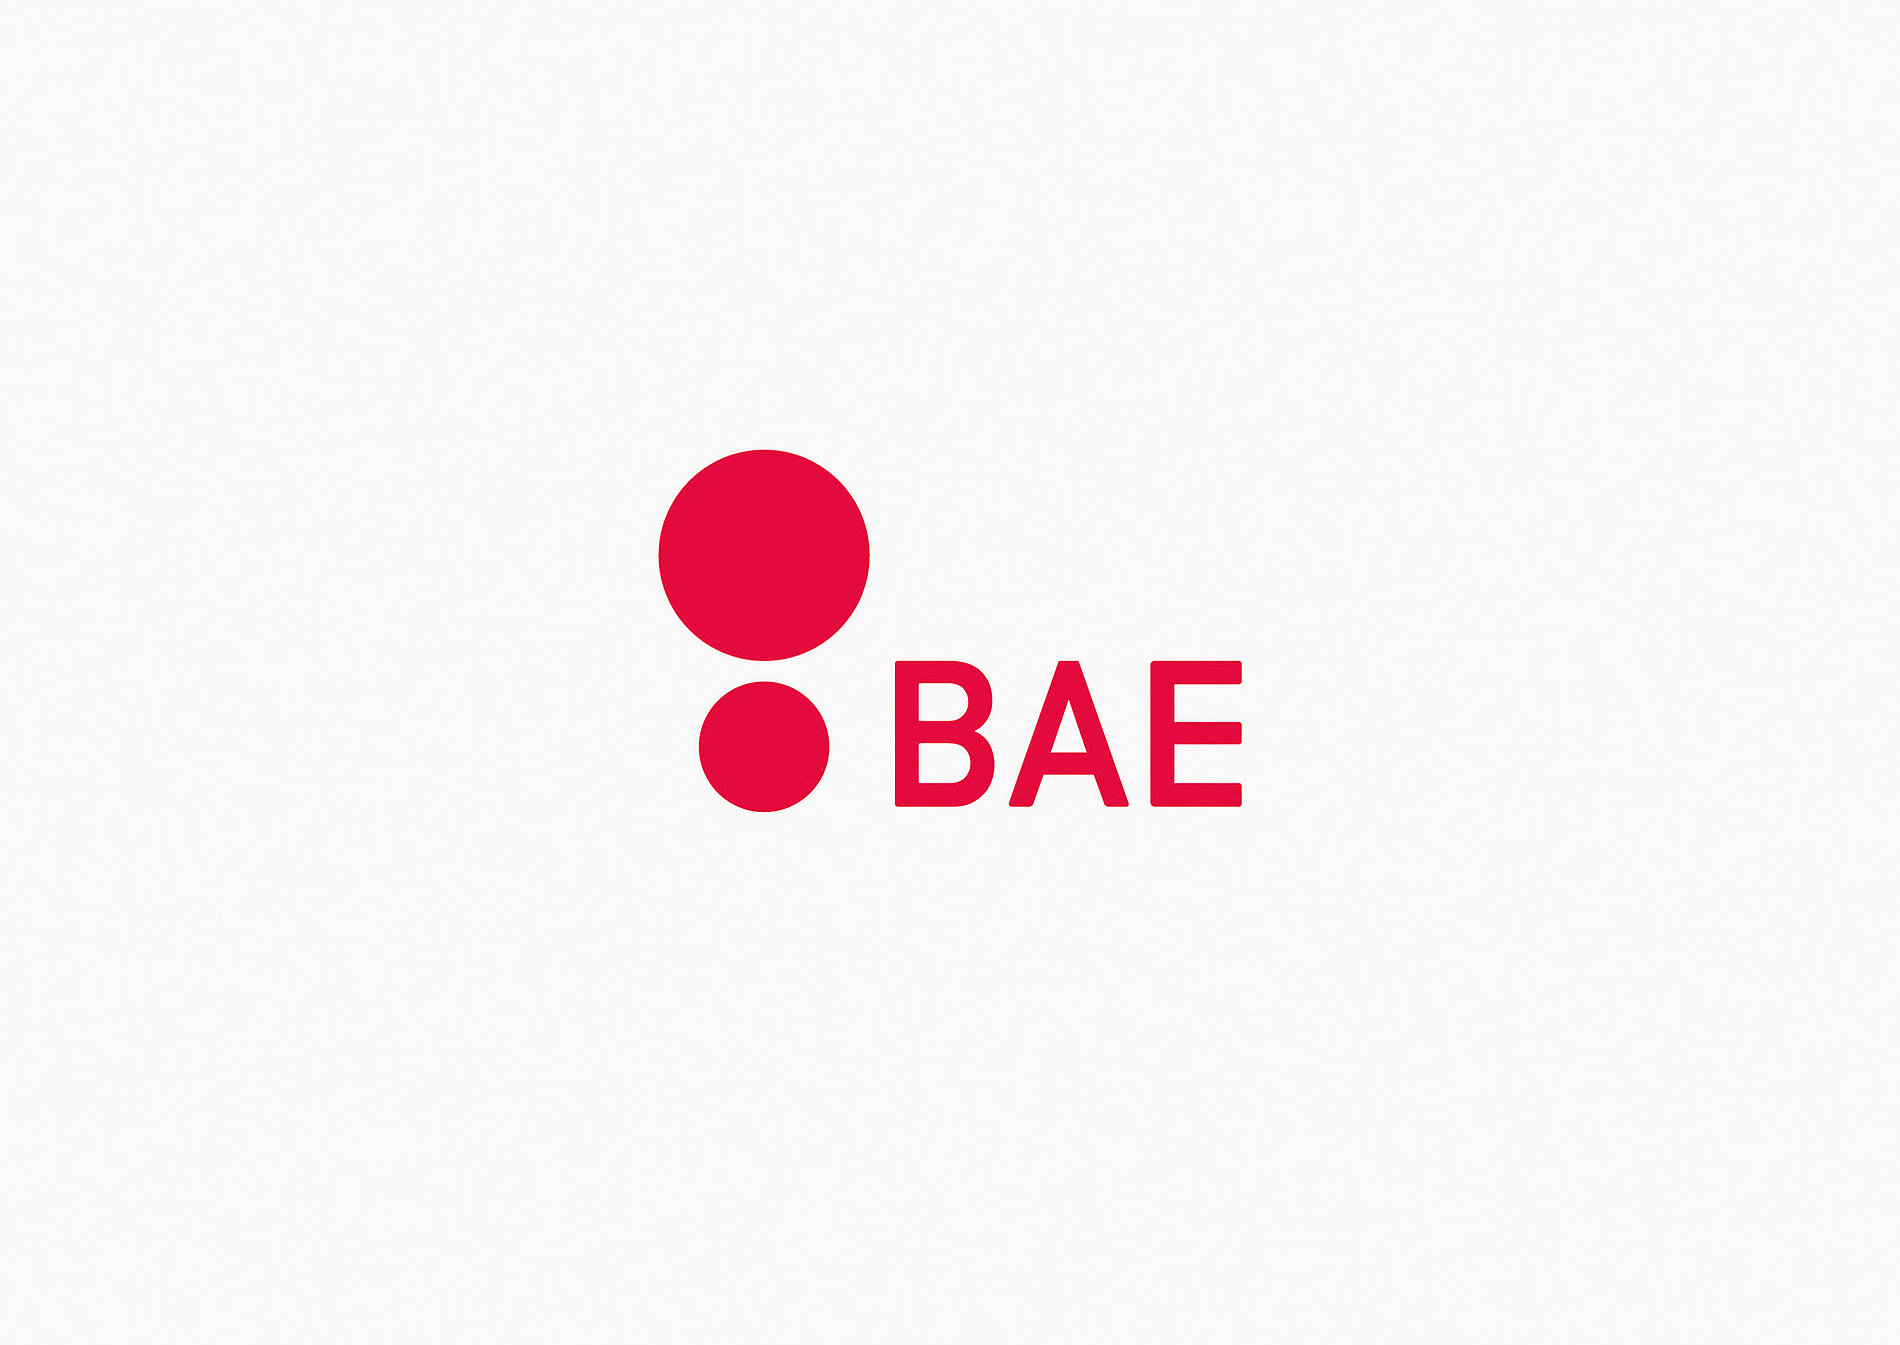 BAE | Red Dot Design Award